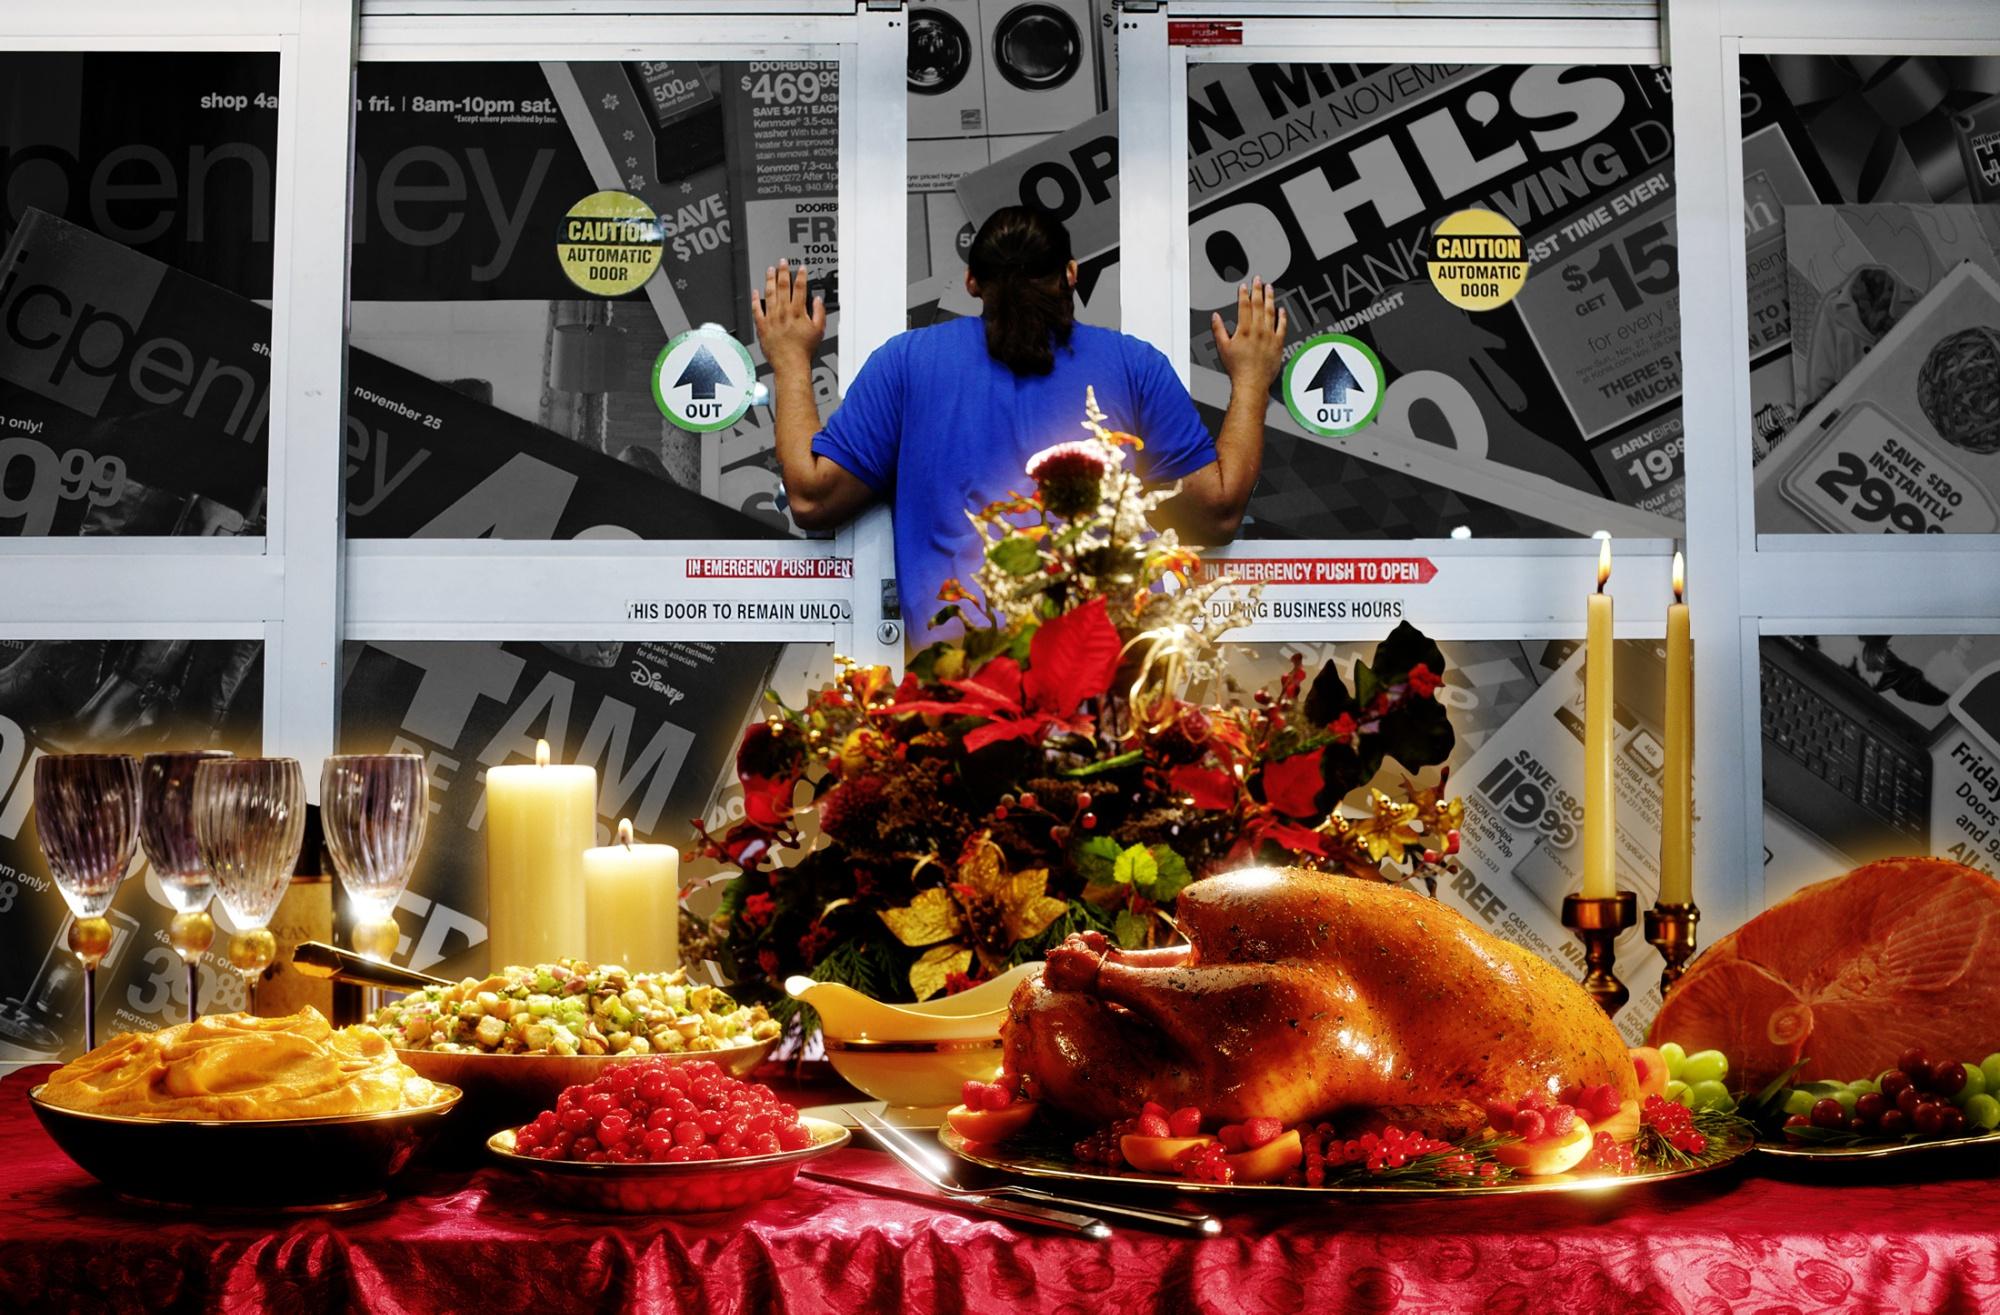 bloomberg.com - Marisa Gertz - How Black Friday Became America's Greediest Holiday